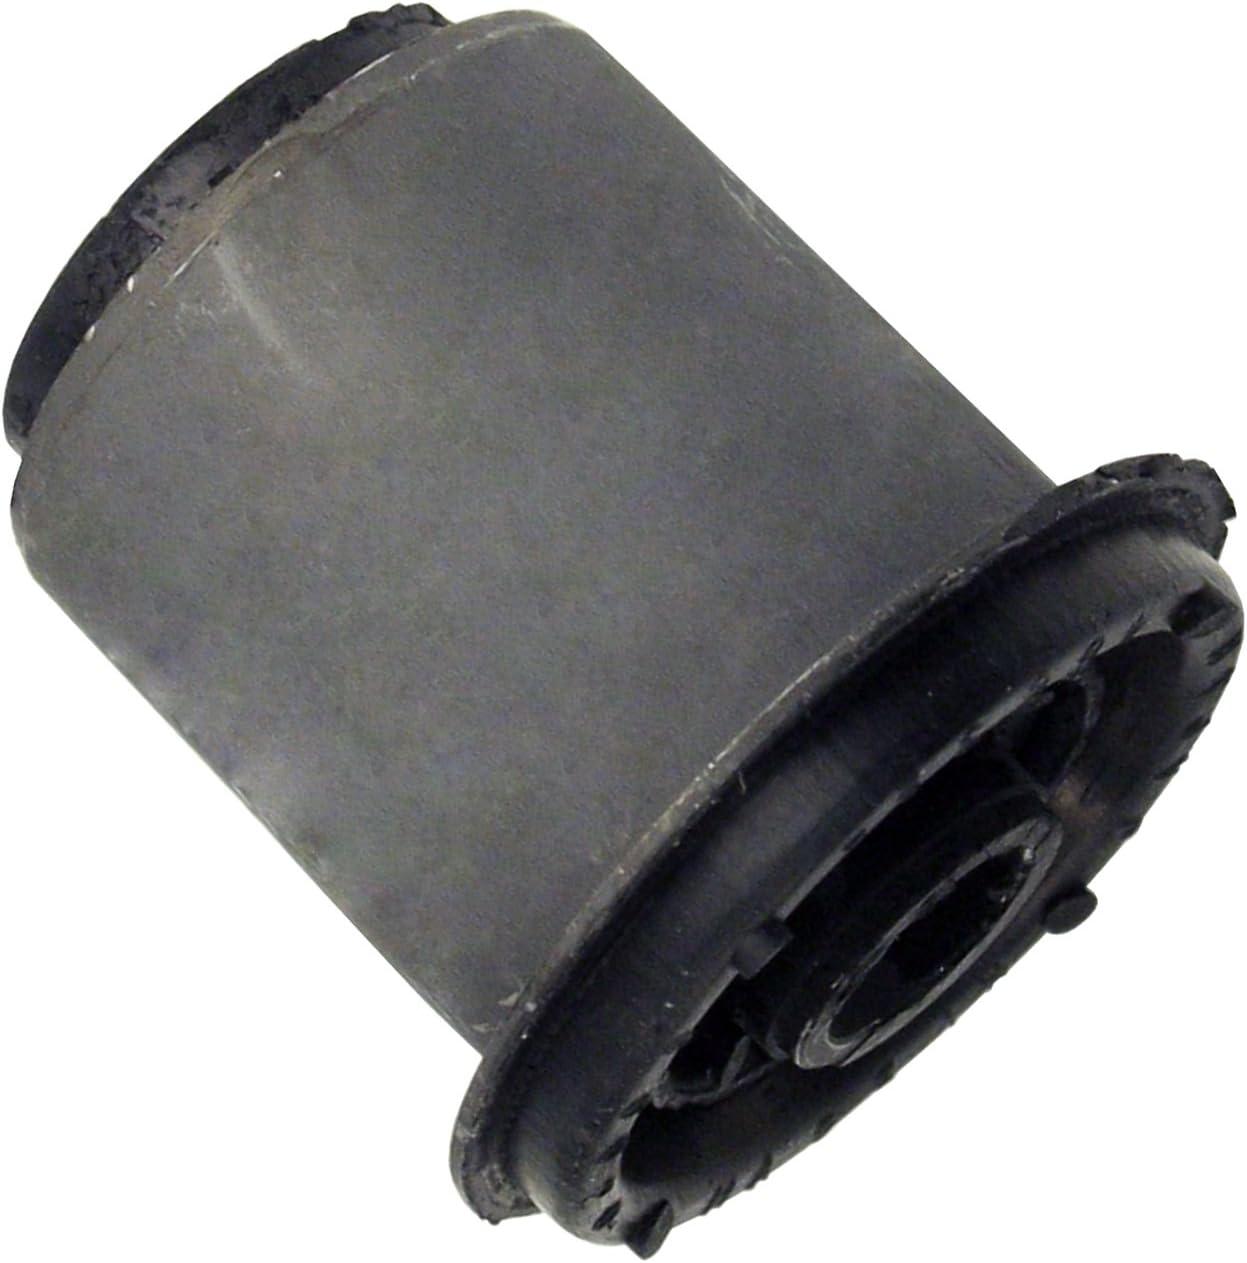 Beck Arnley 101-7493 Control Arm Bushing